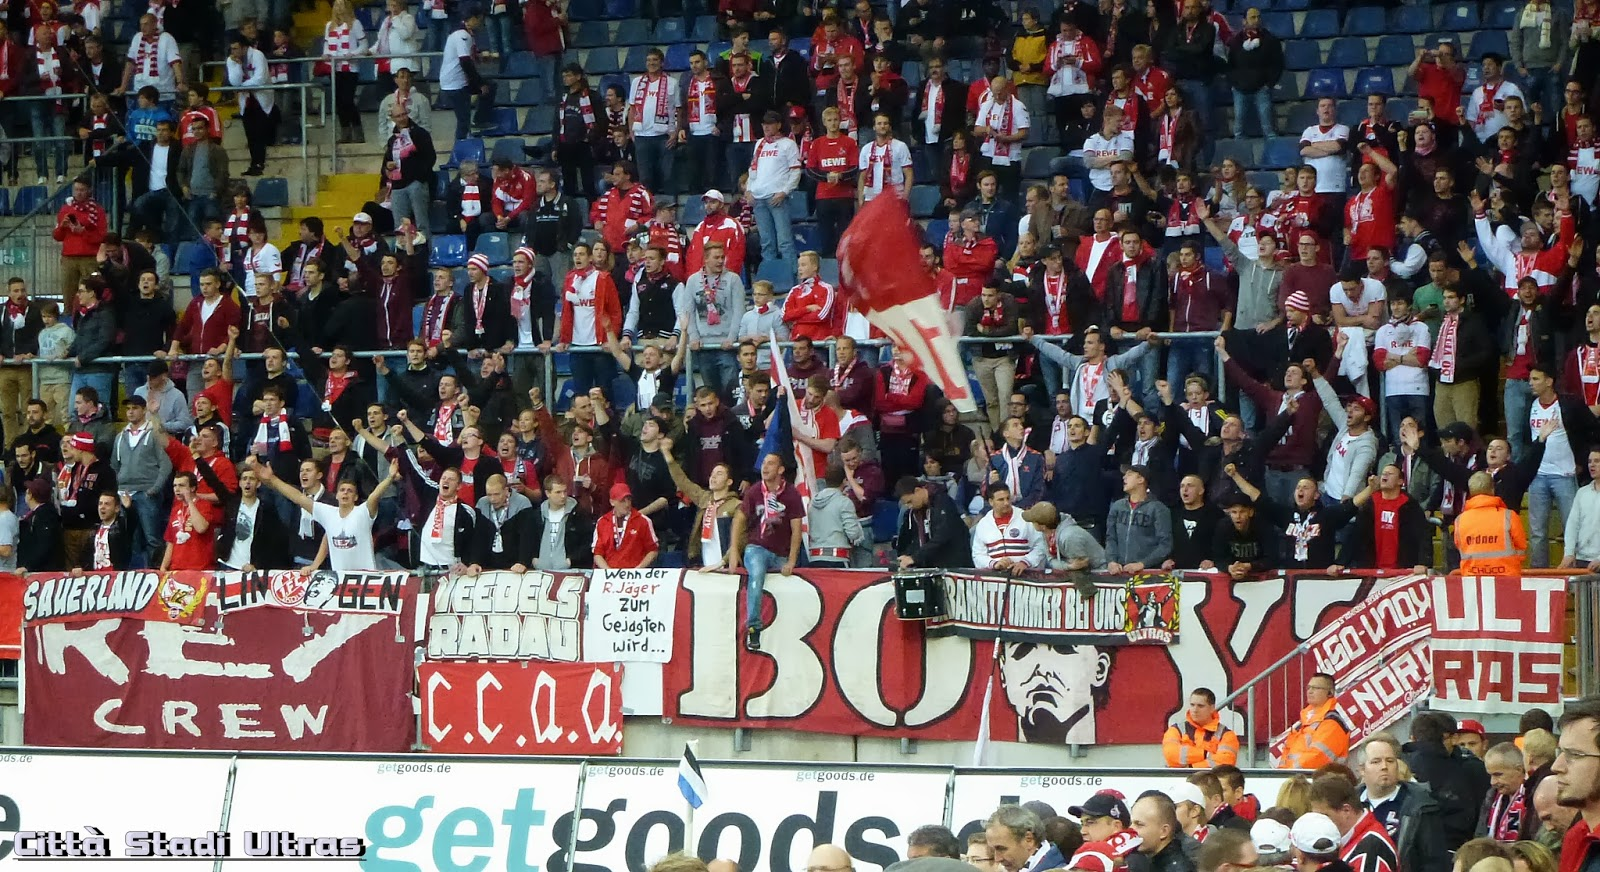 Ultras Bielefeld